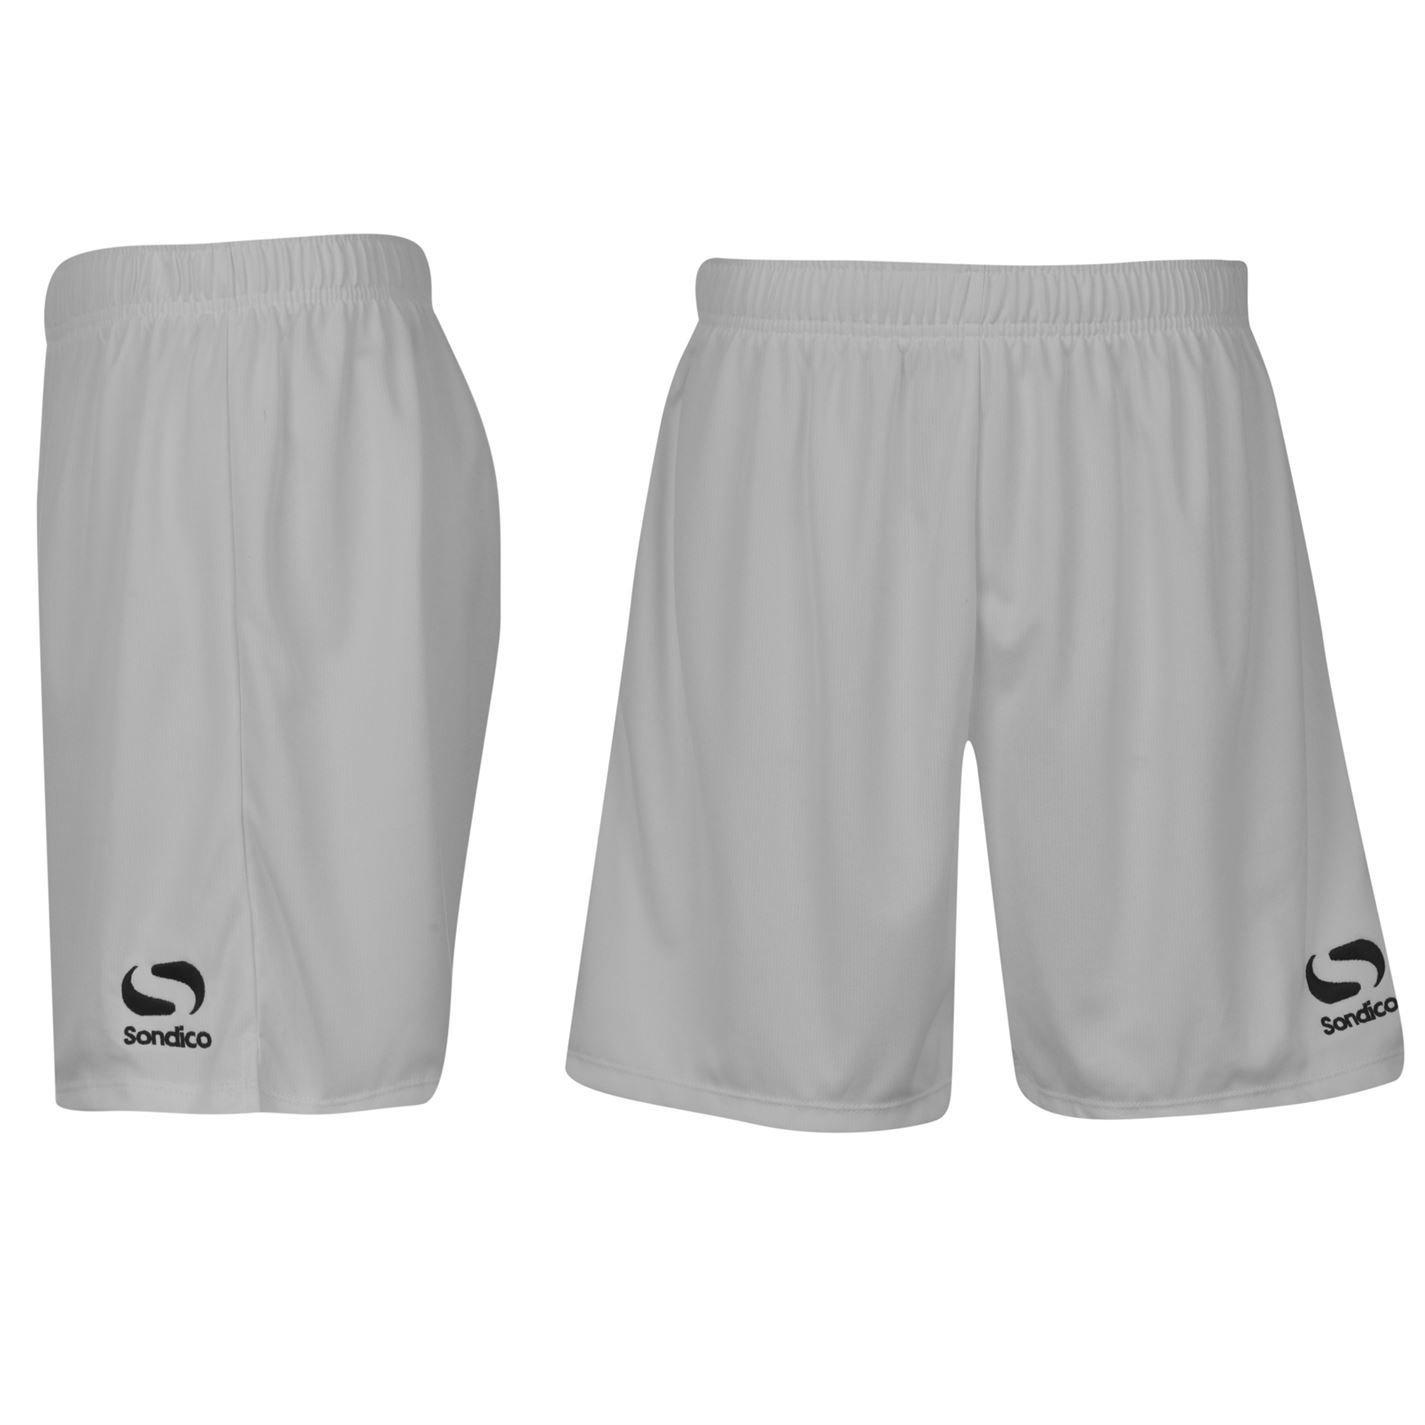 Activewear Black Sondico Sports Football Shorts Adult Size Xs